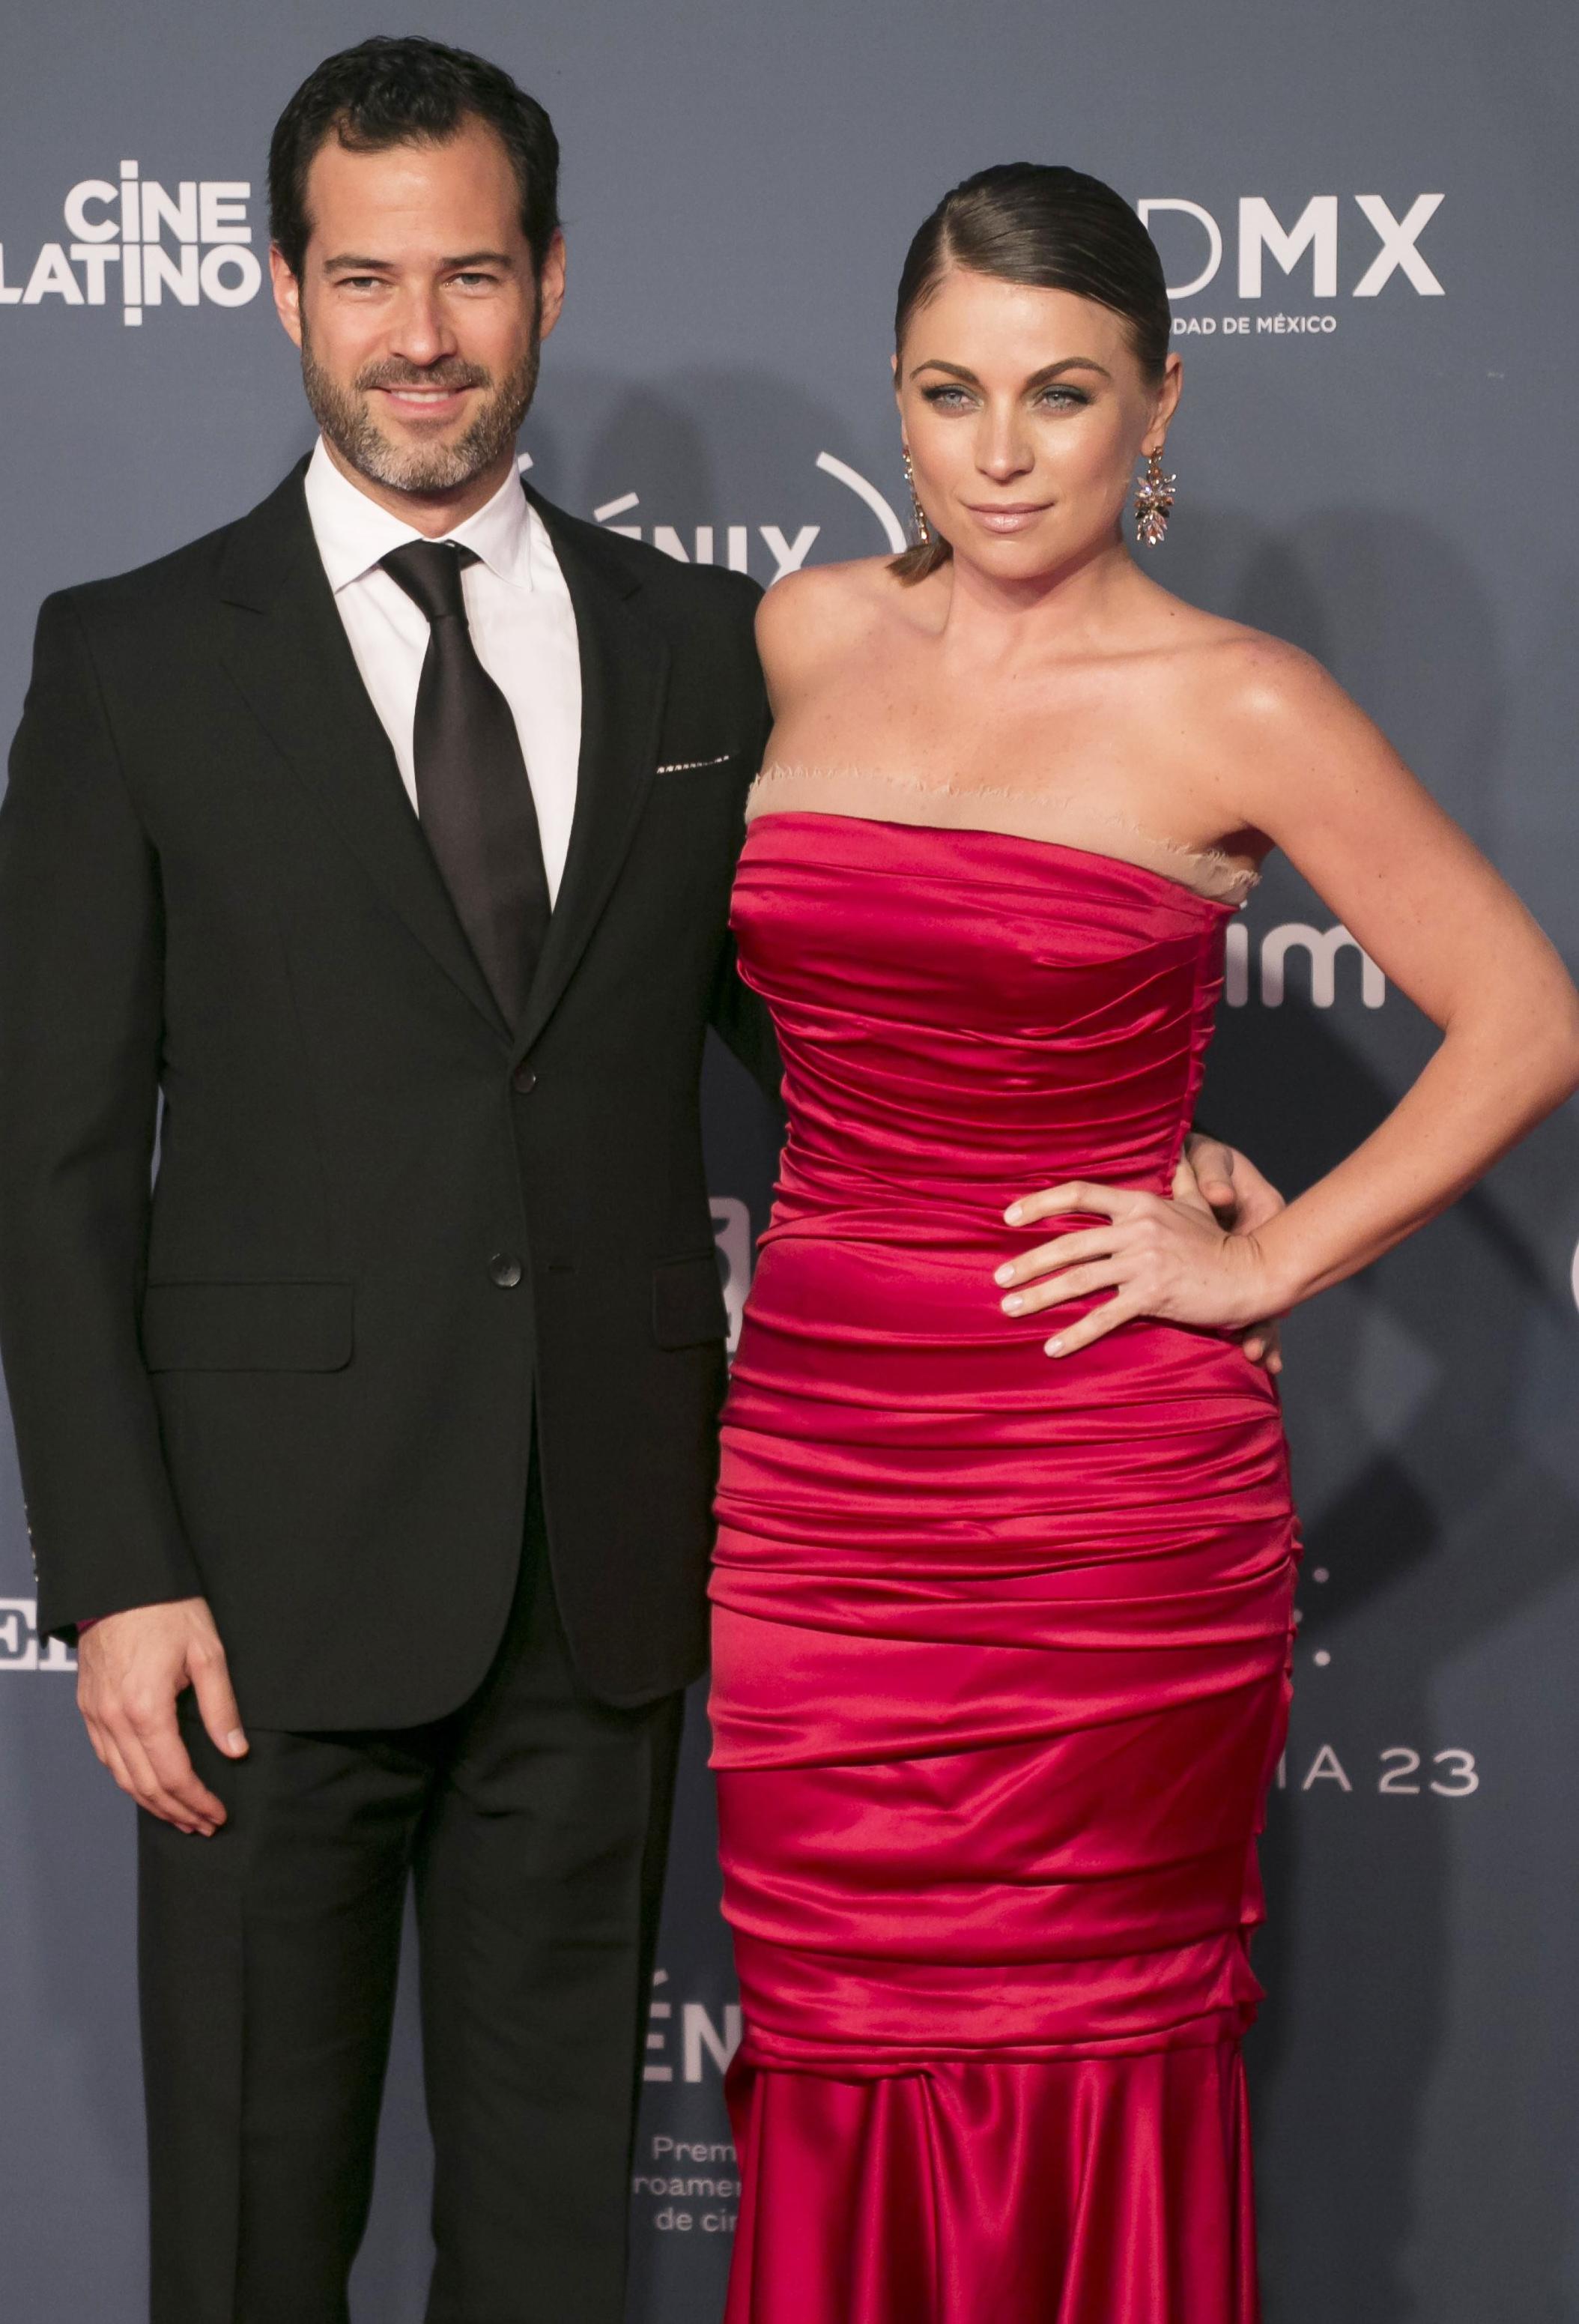 Emiliano Salinas and Ludwika Paleta